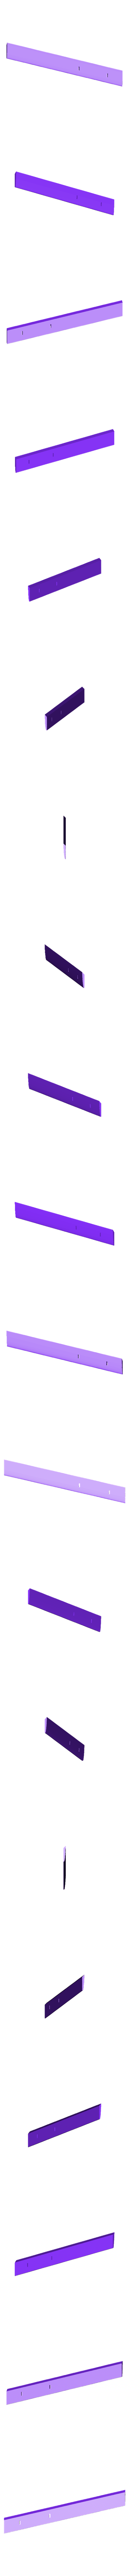 Aileron-1 Rev01.STL Download free STL file V1 Release - New RC Plane • 3D printable design, Trikonics